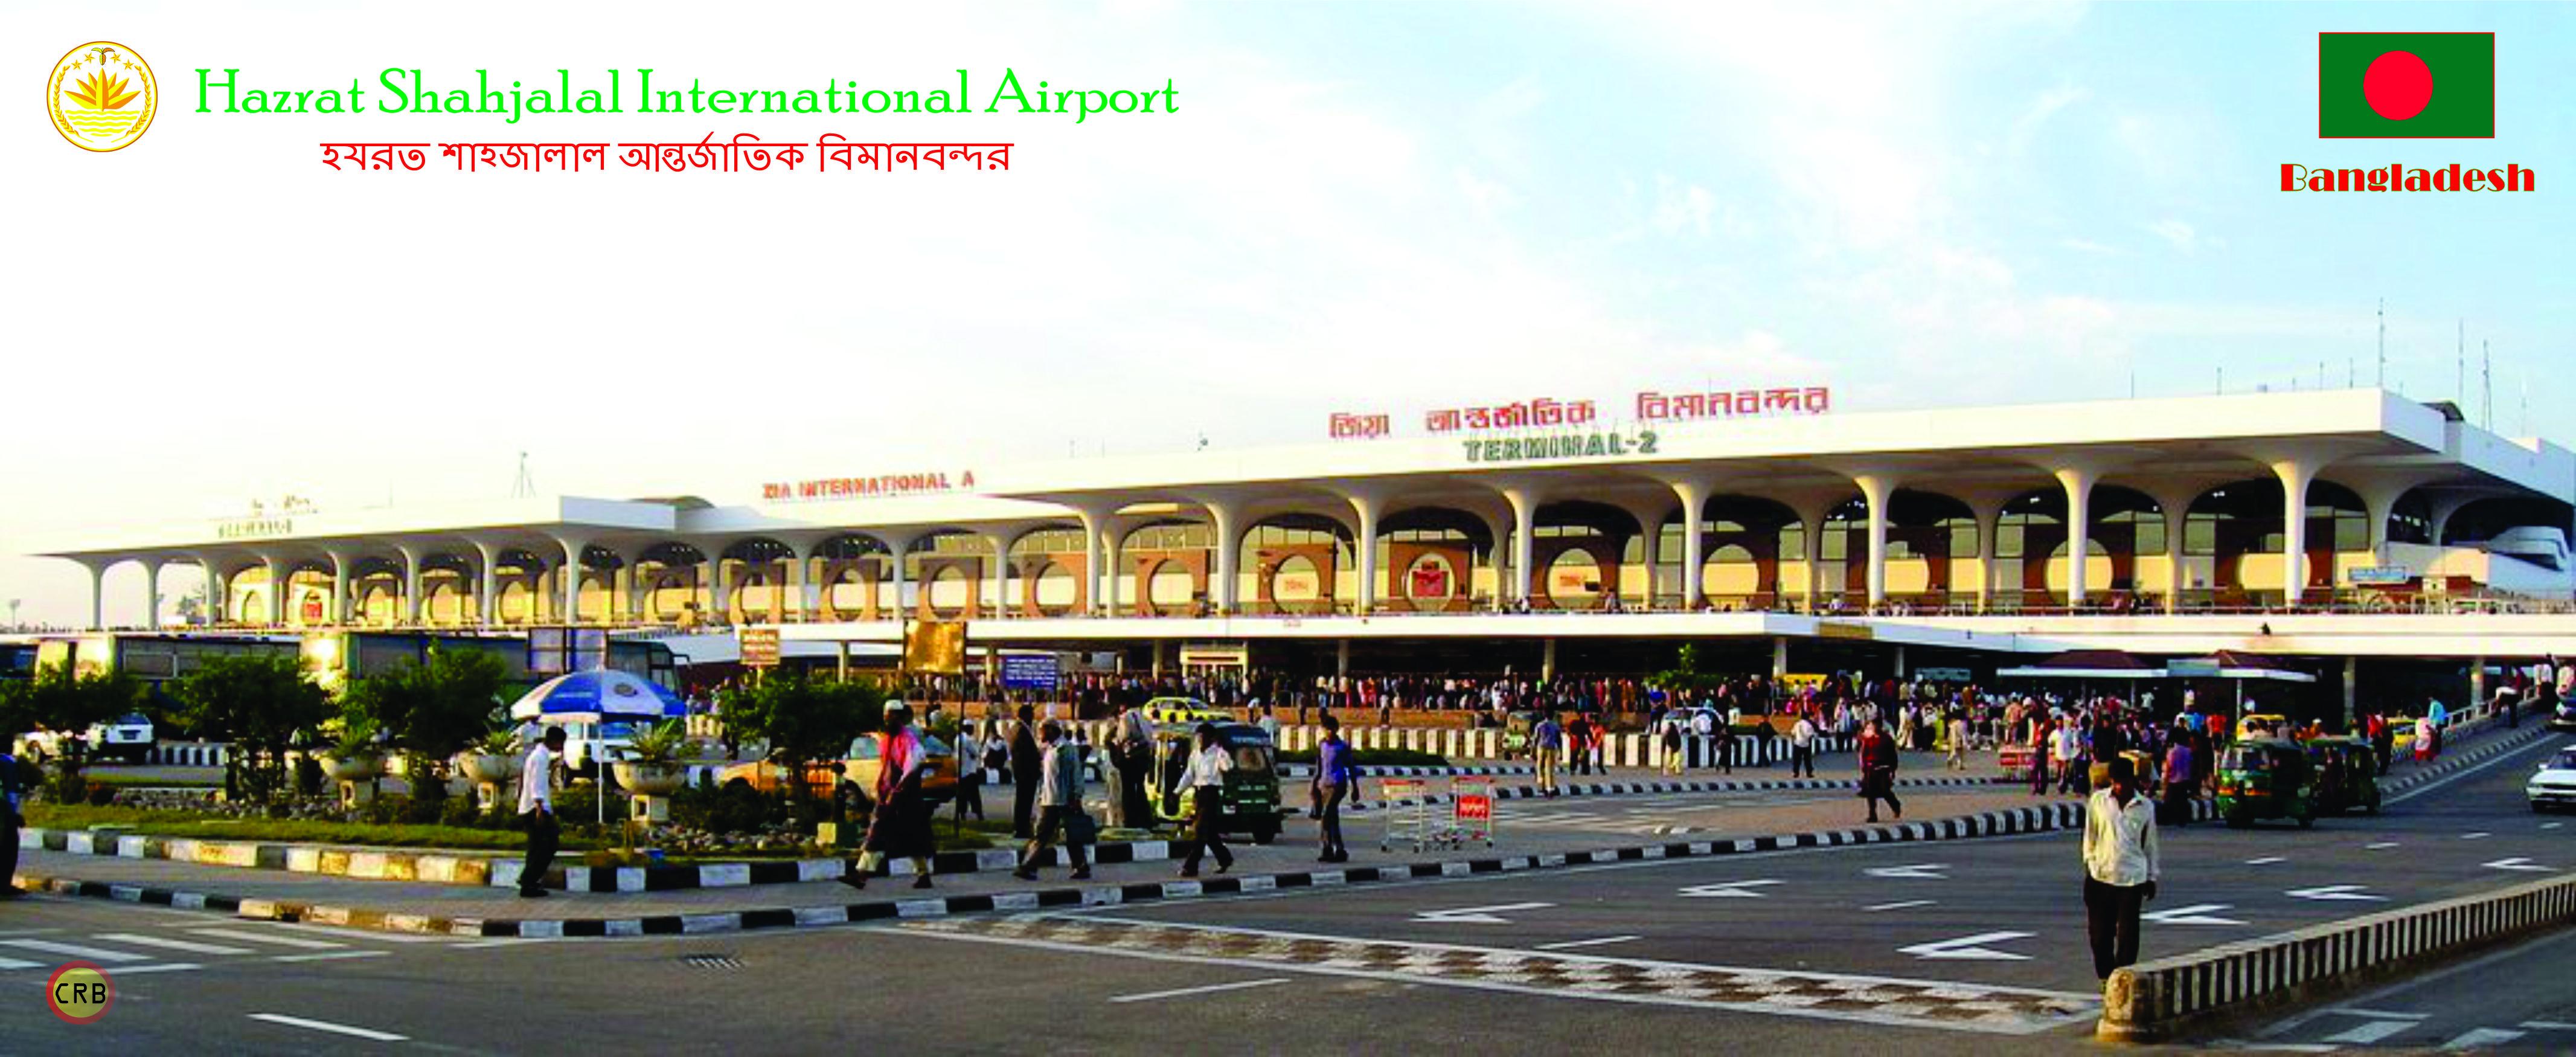 Bangladesh Airlines At Zia International Airport Dhaka Bangladesh International Airport National Airlines Dhaka